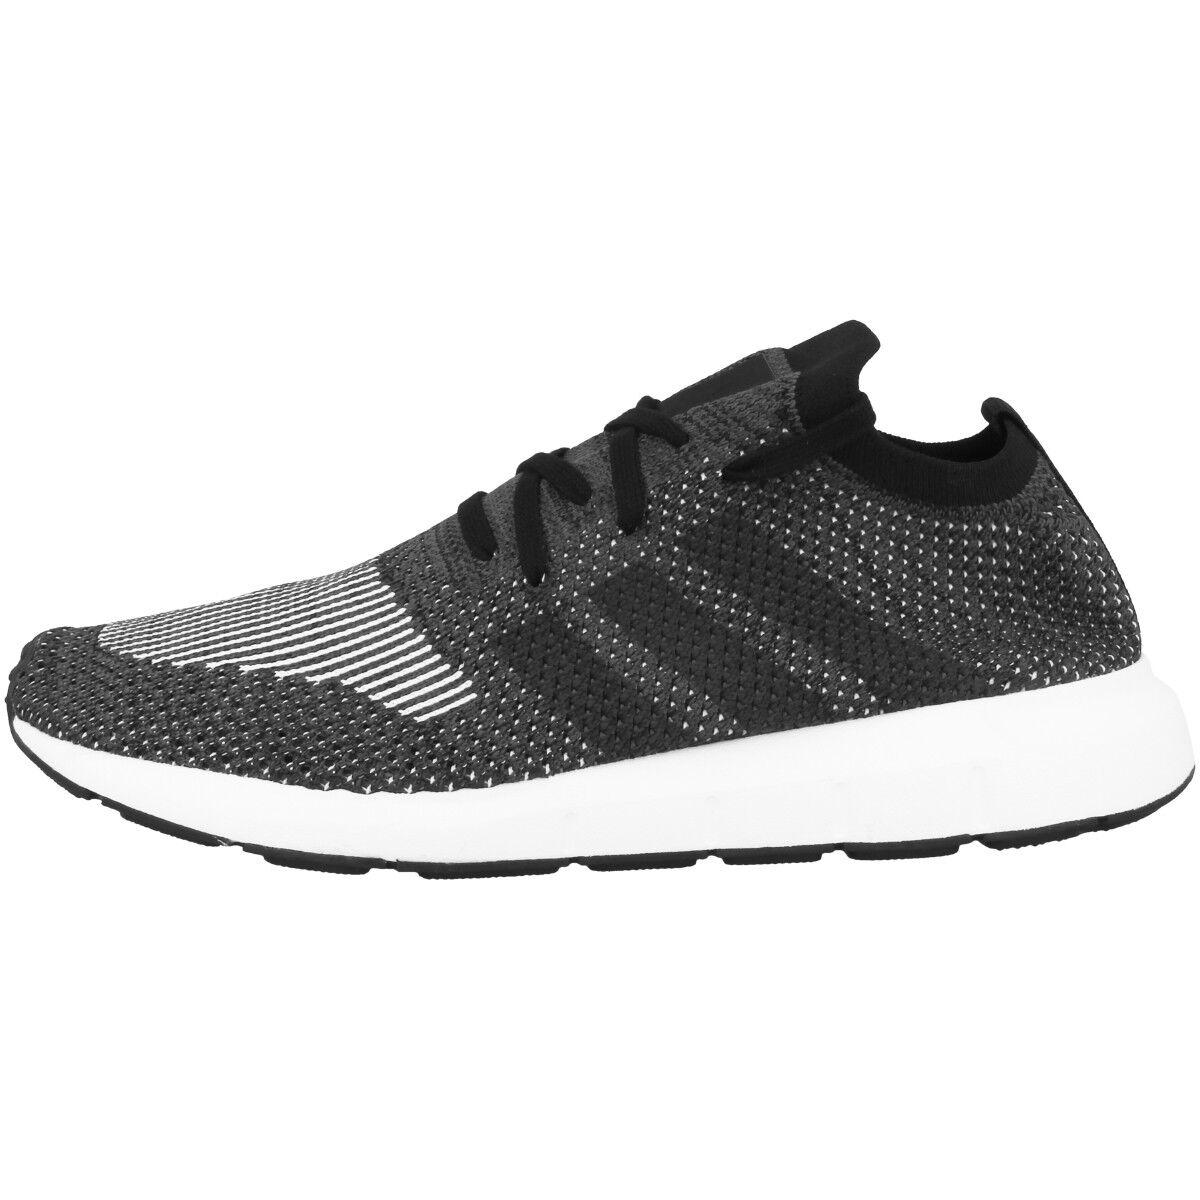 Adidas Freizeit Swift Run PK Zapatos Freizeit Adidas Sneakers Primeknit Sneaker Negro Gris CQ2889 eec922